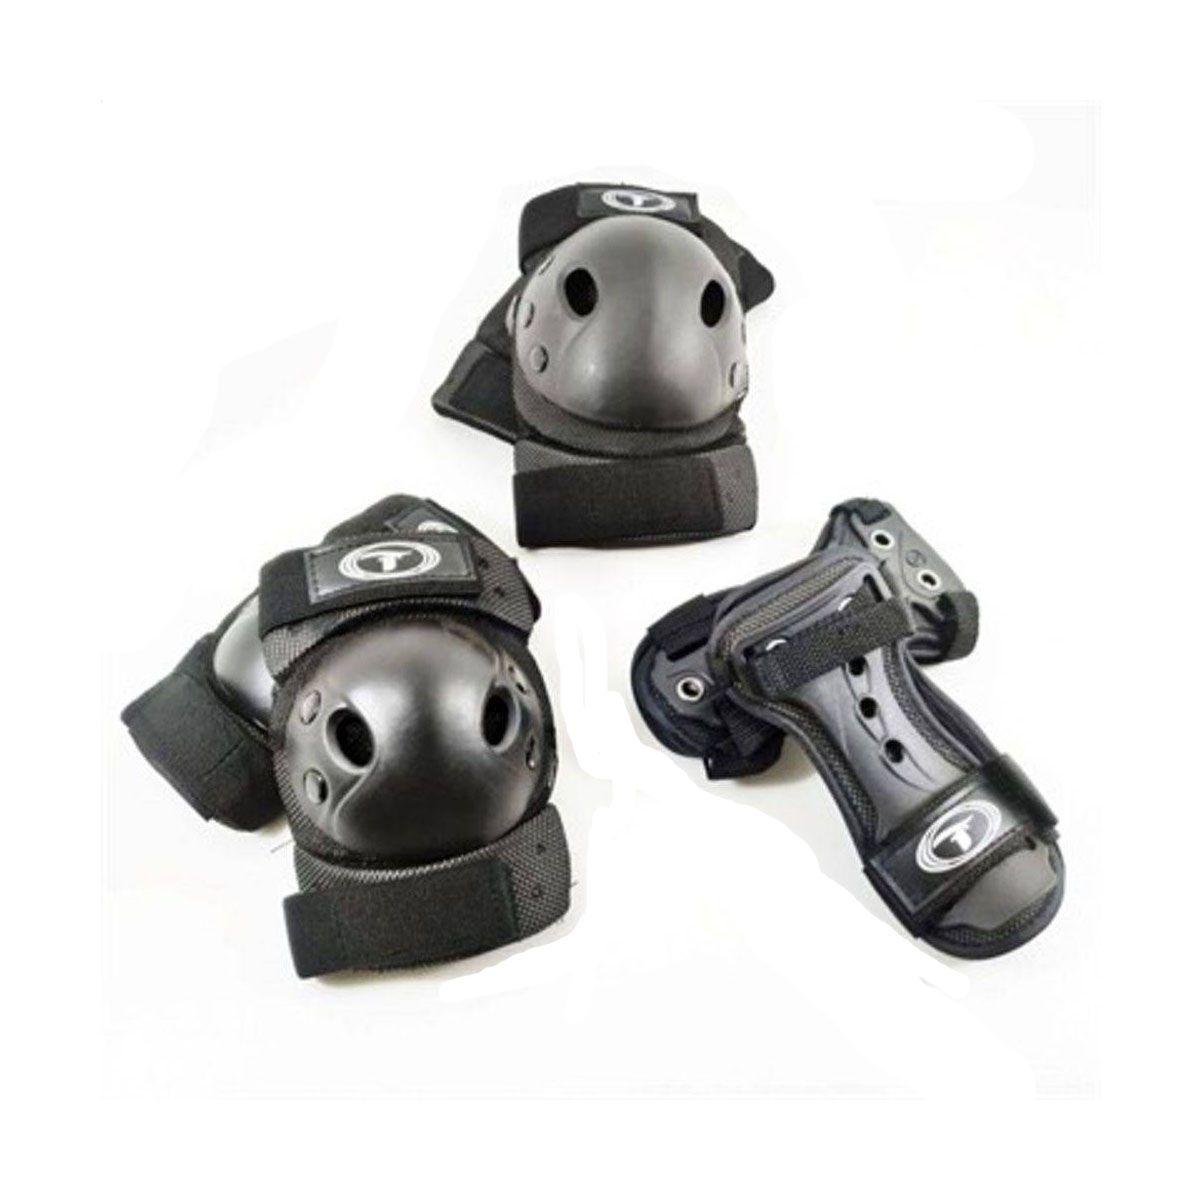 Kit Proteção Patins Traxart SSE-613